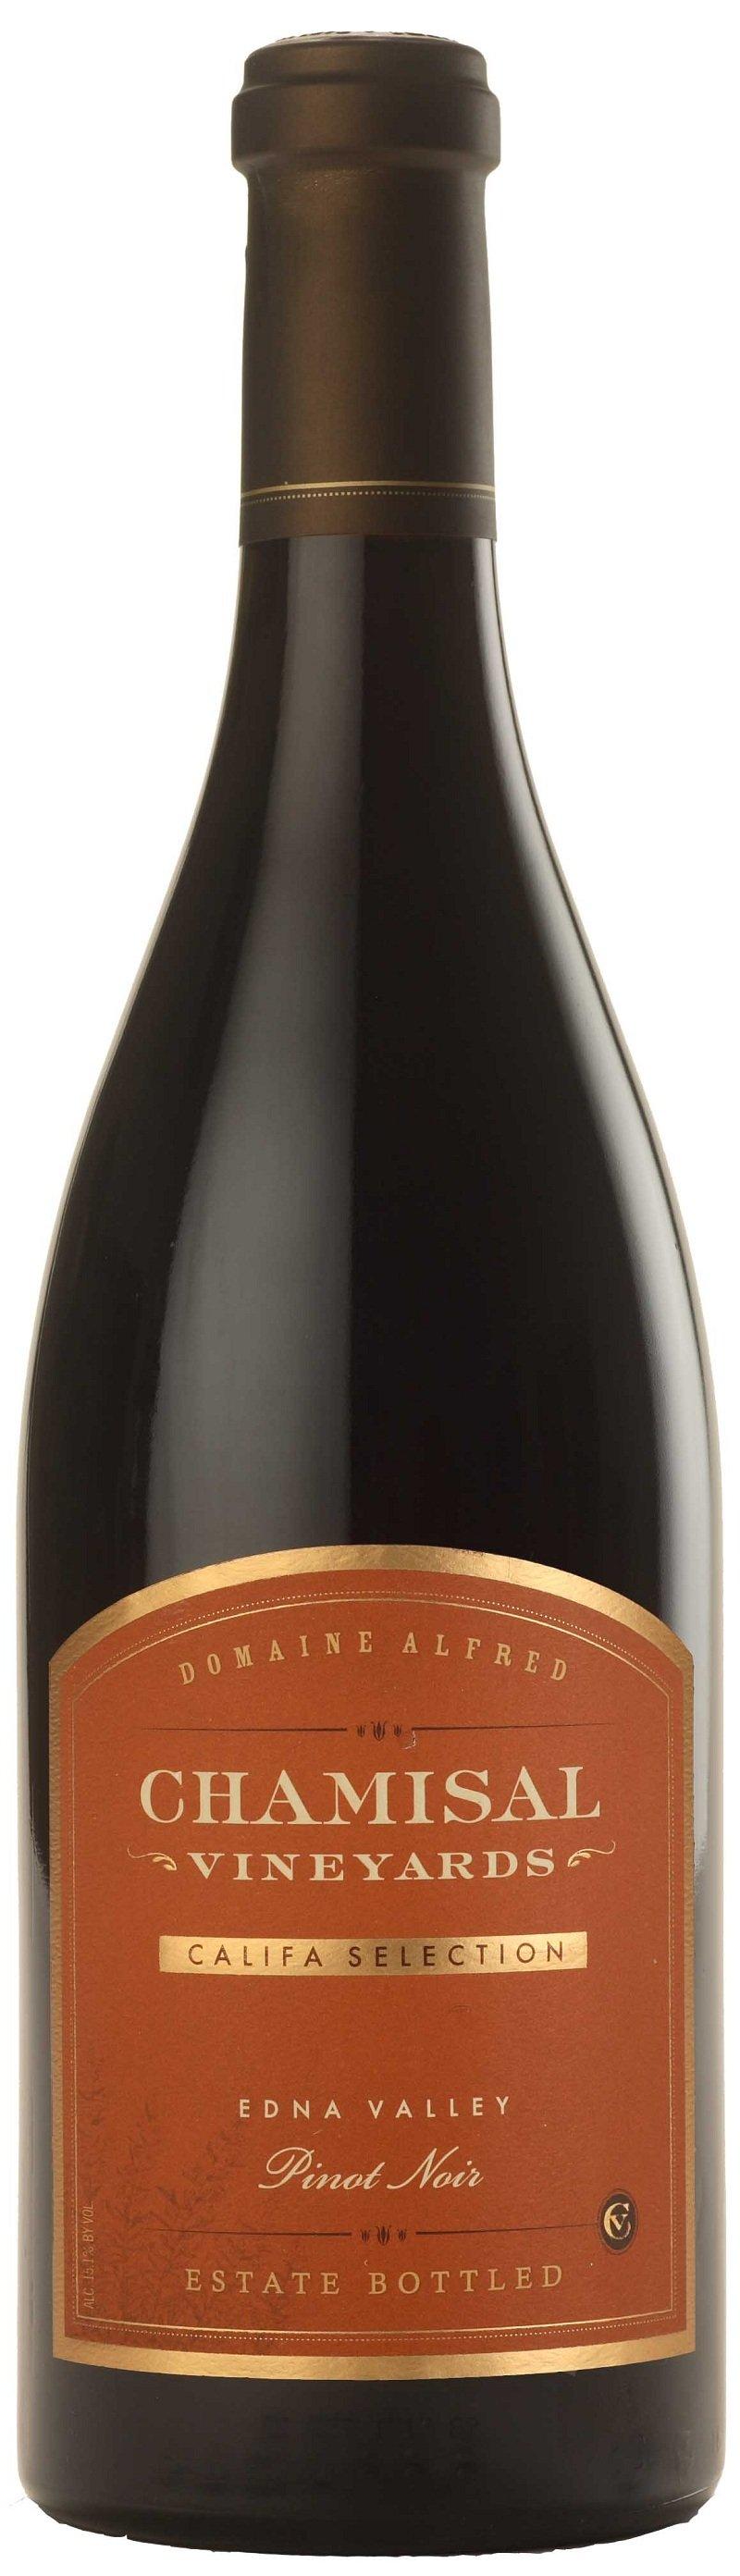 "2009 Chamisal Vineyards Pinot Noir ""Califa Selection"" Edna Valley"